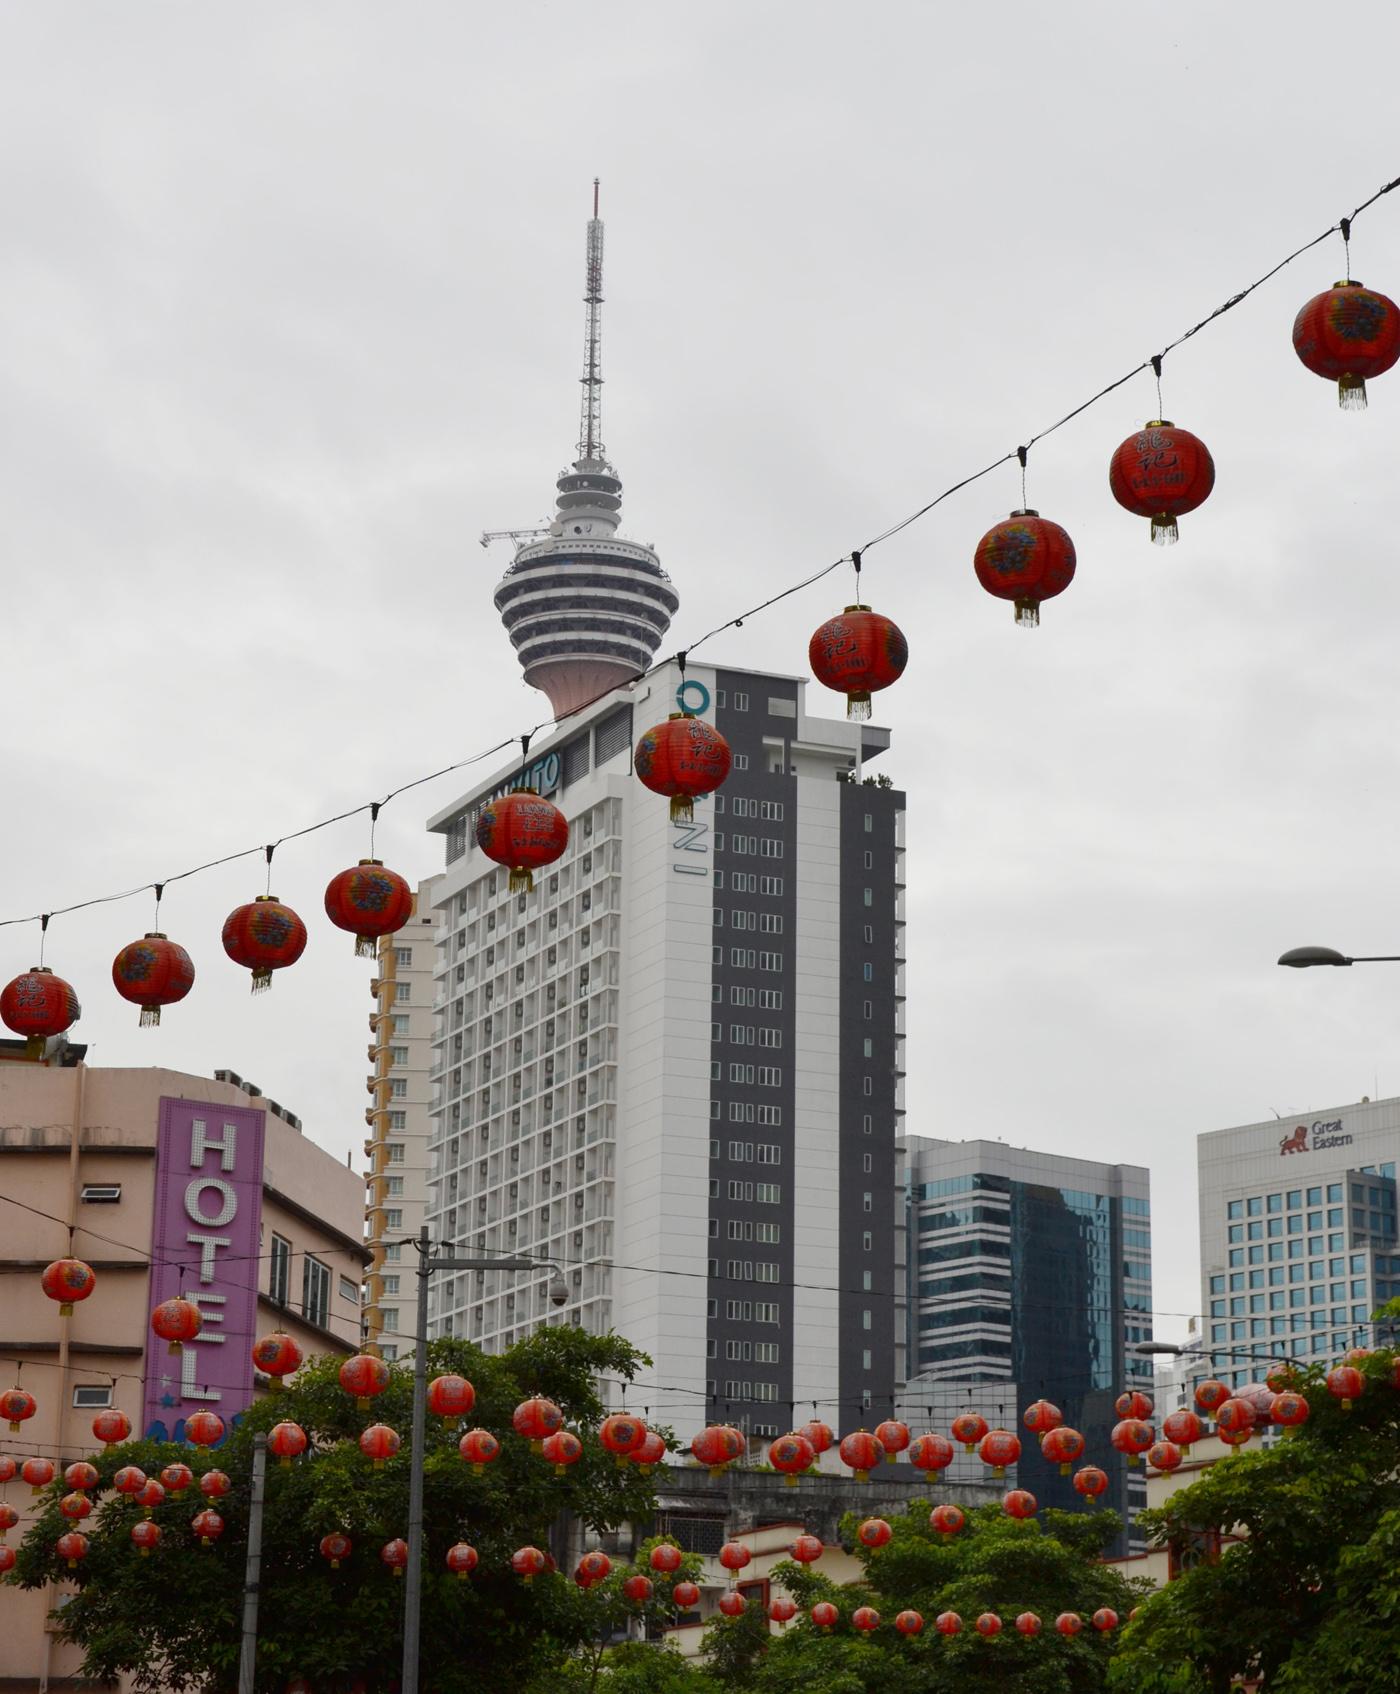 What-to-do-in-Kuala-Lumpur-gucki-streetfood